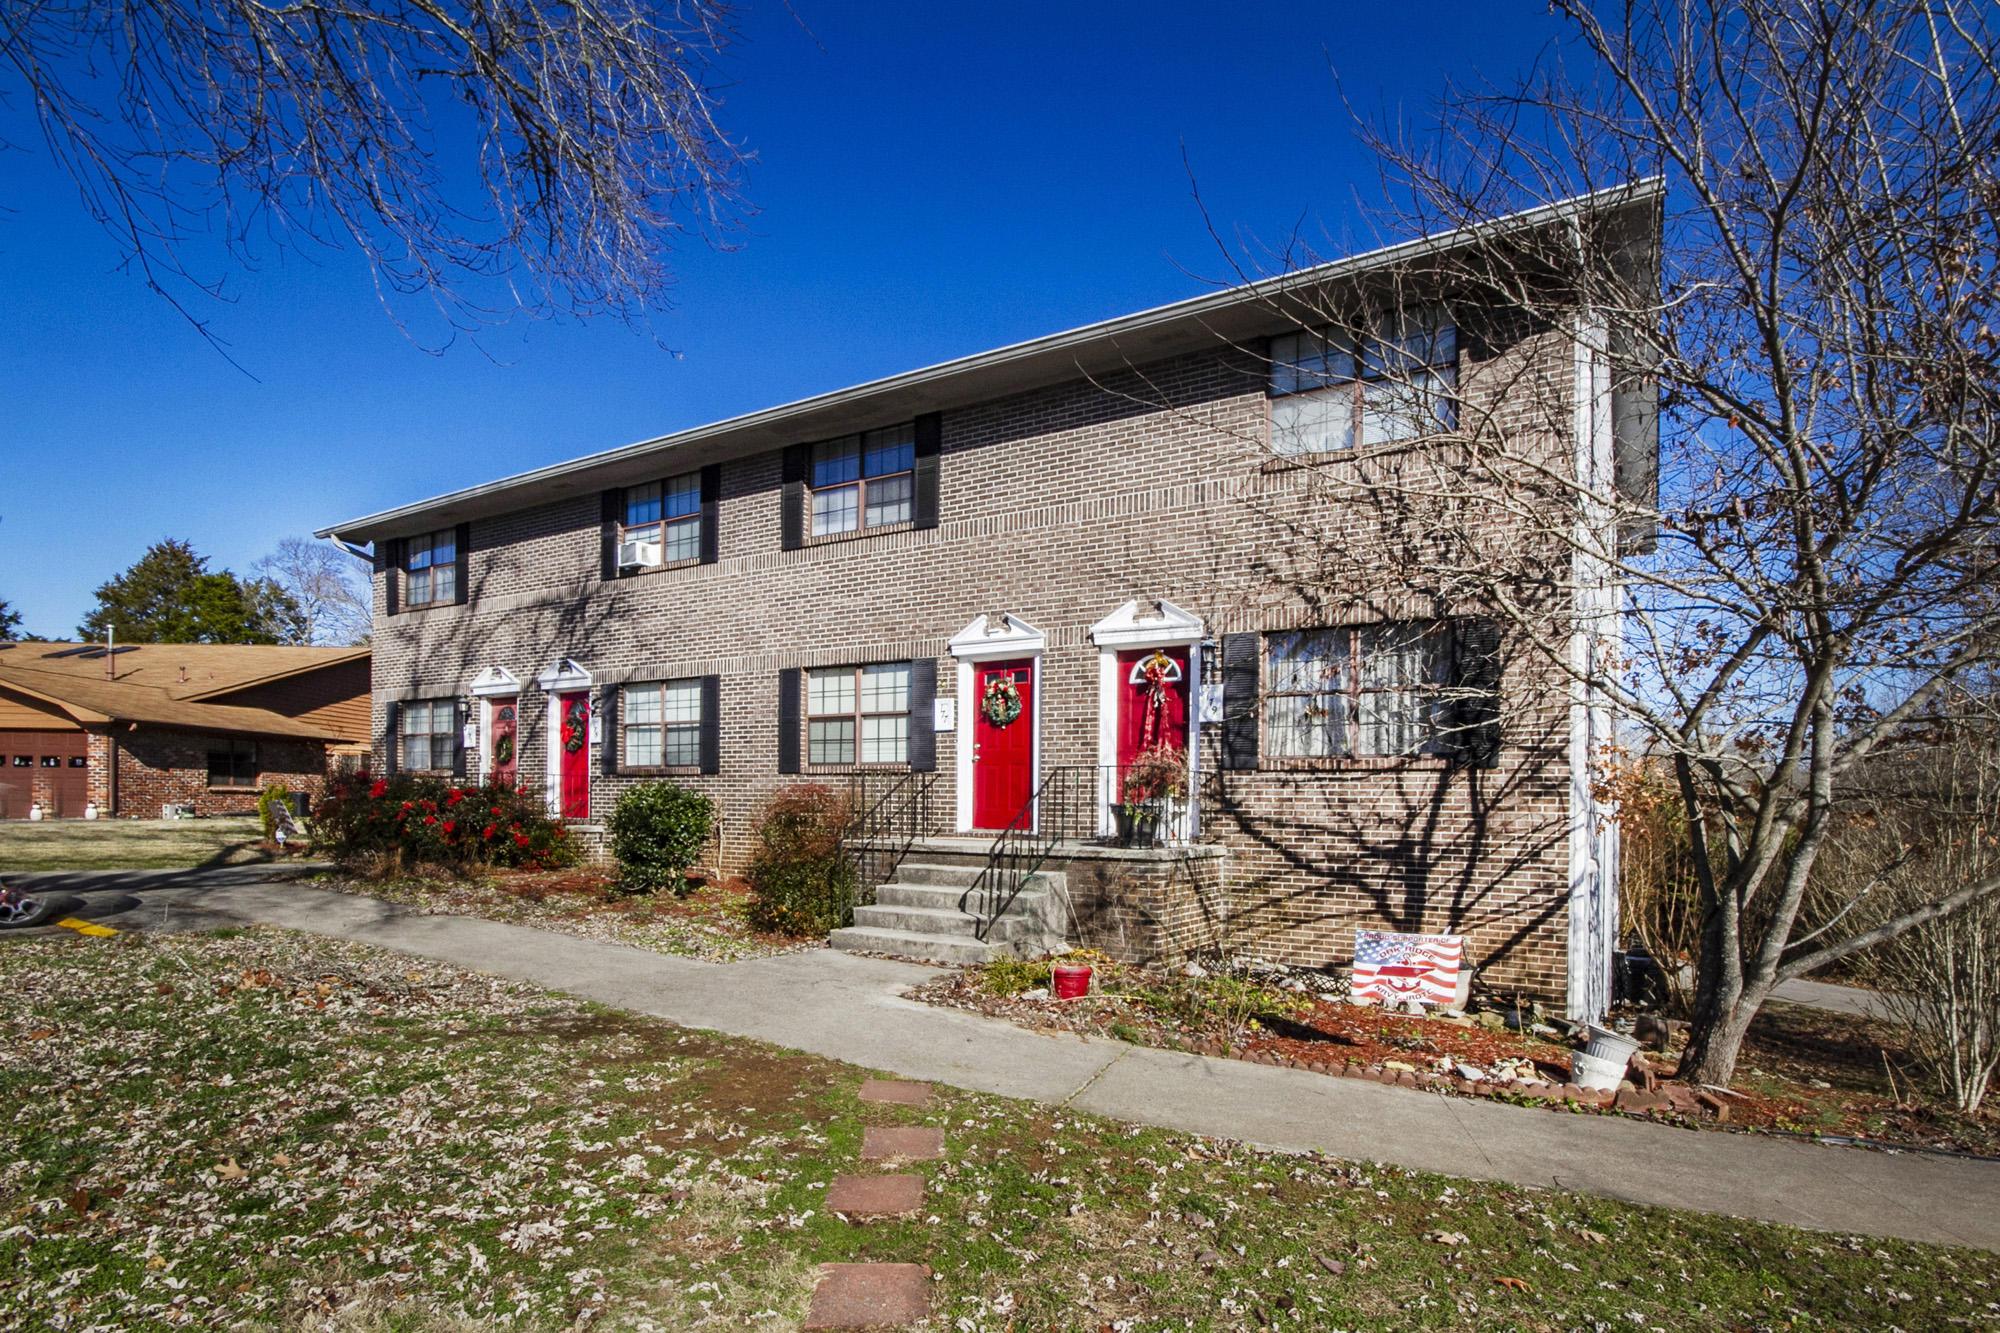 179 Golfcrest Lane, Oak Ridge, Tennessee 37830, 3 Bedrooms Bedrooms, ,2 BathroomsBathrooms,Single Family,For Sale,Golfcrest,1101871